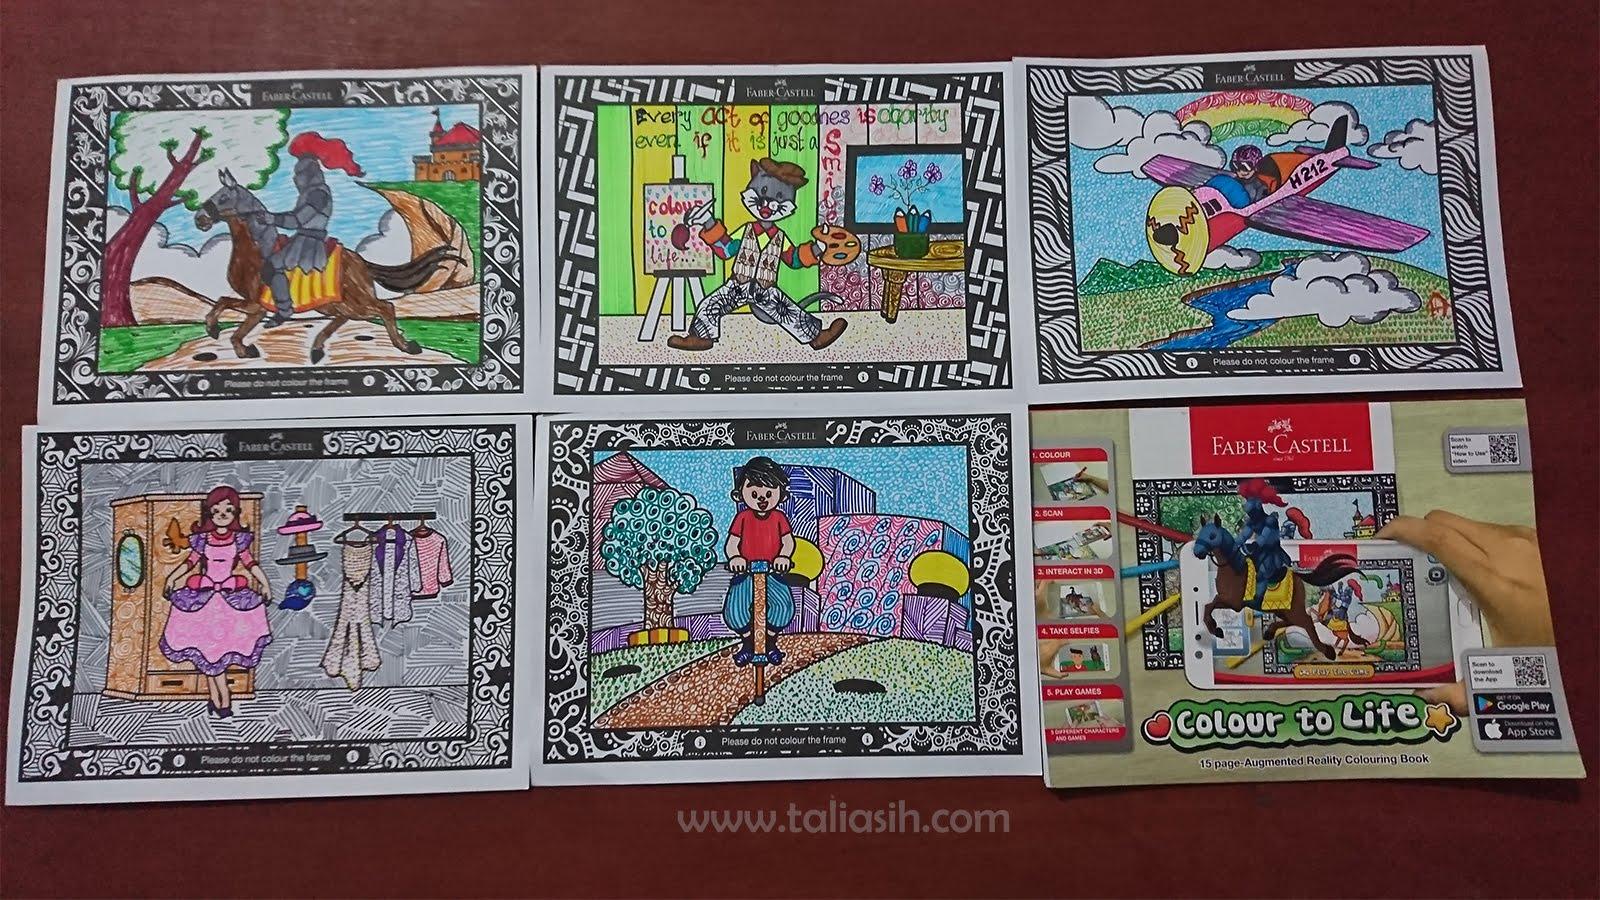 Cara Merelaksasikan Diri Dengan Colour To Life Faber Castell